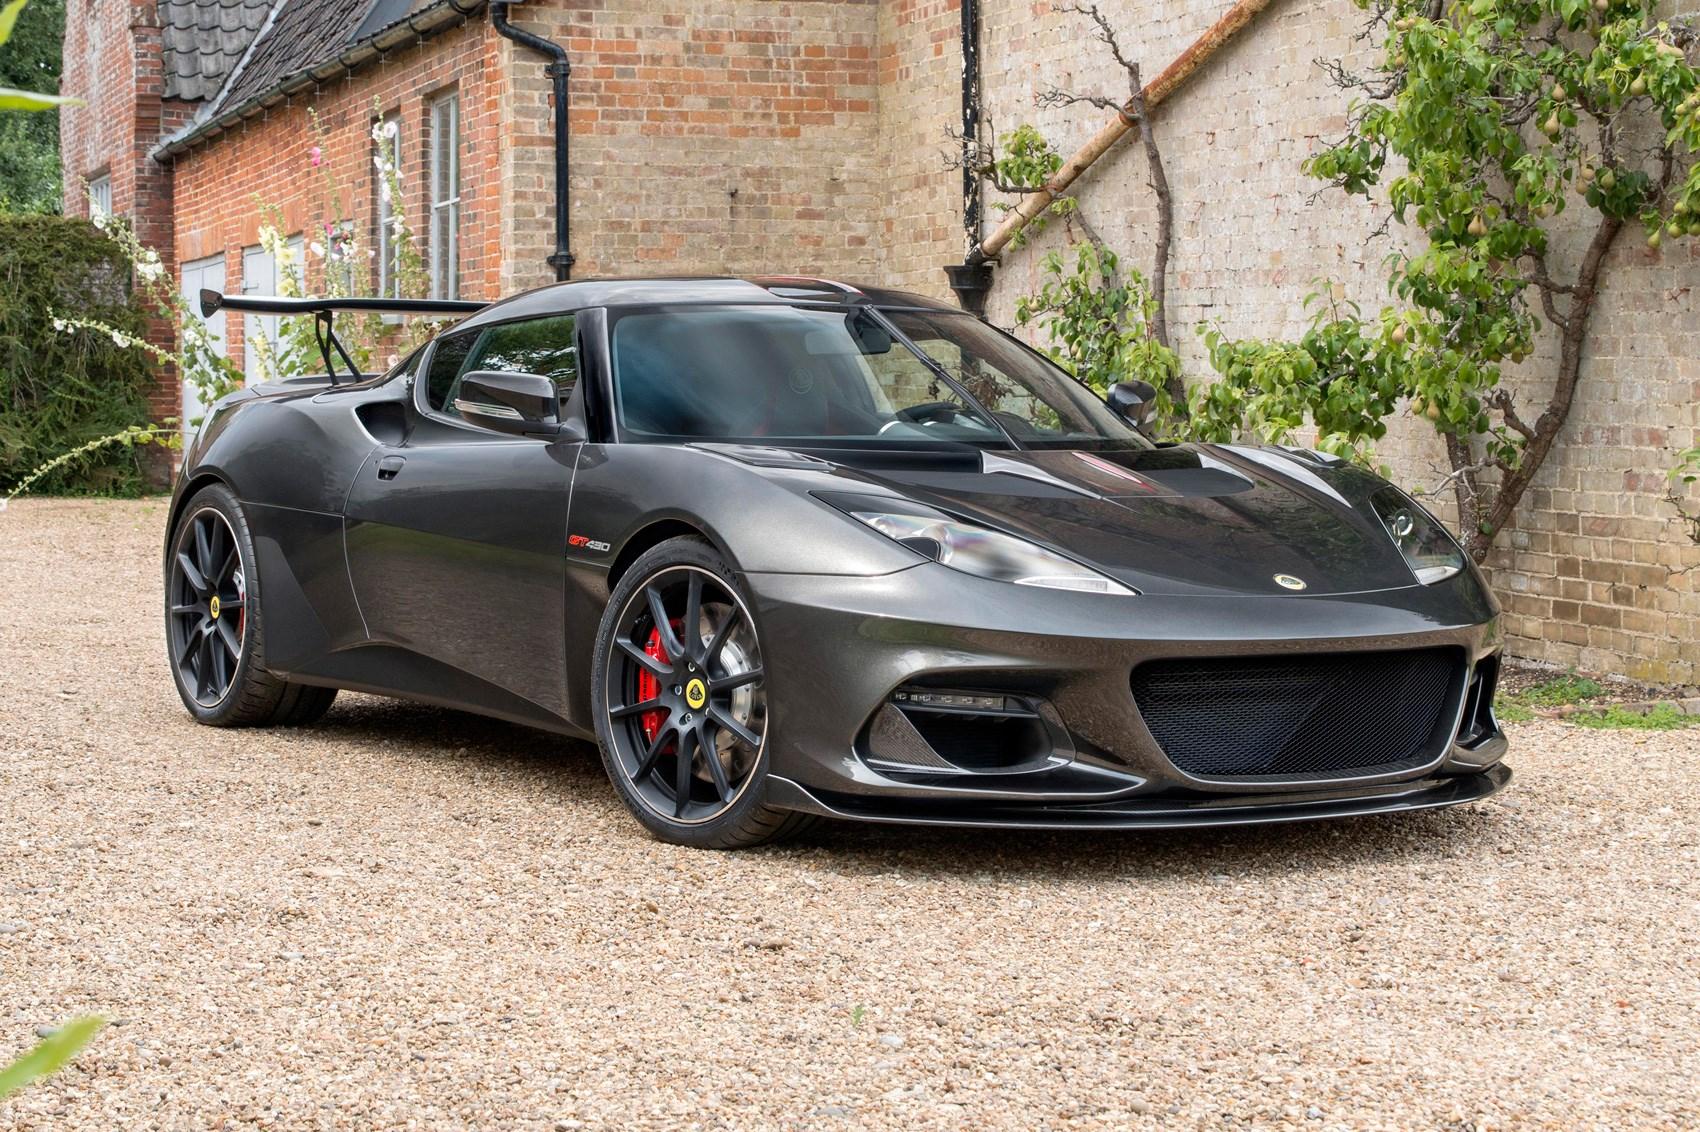 lotus_cars_01 Mesmerizing Lotus Carlton for Sale 2015 Cars Trend